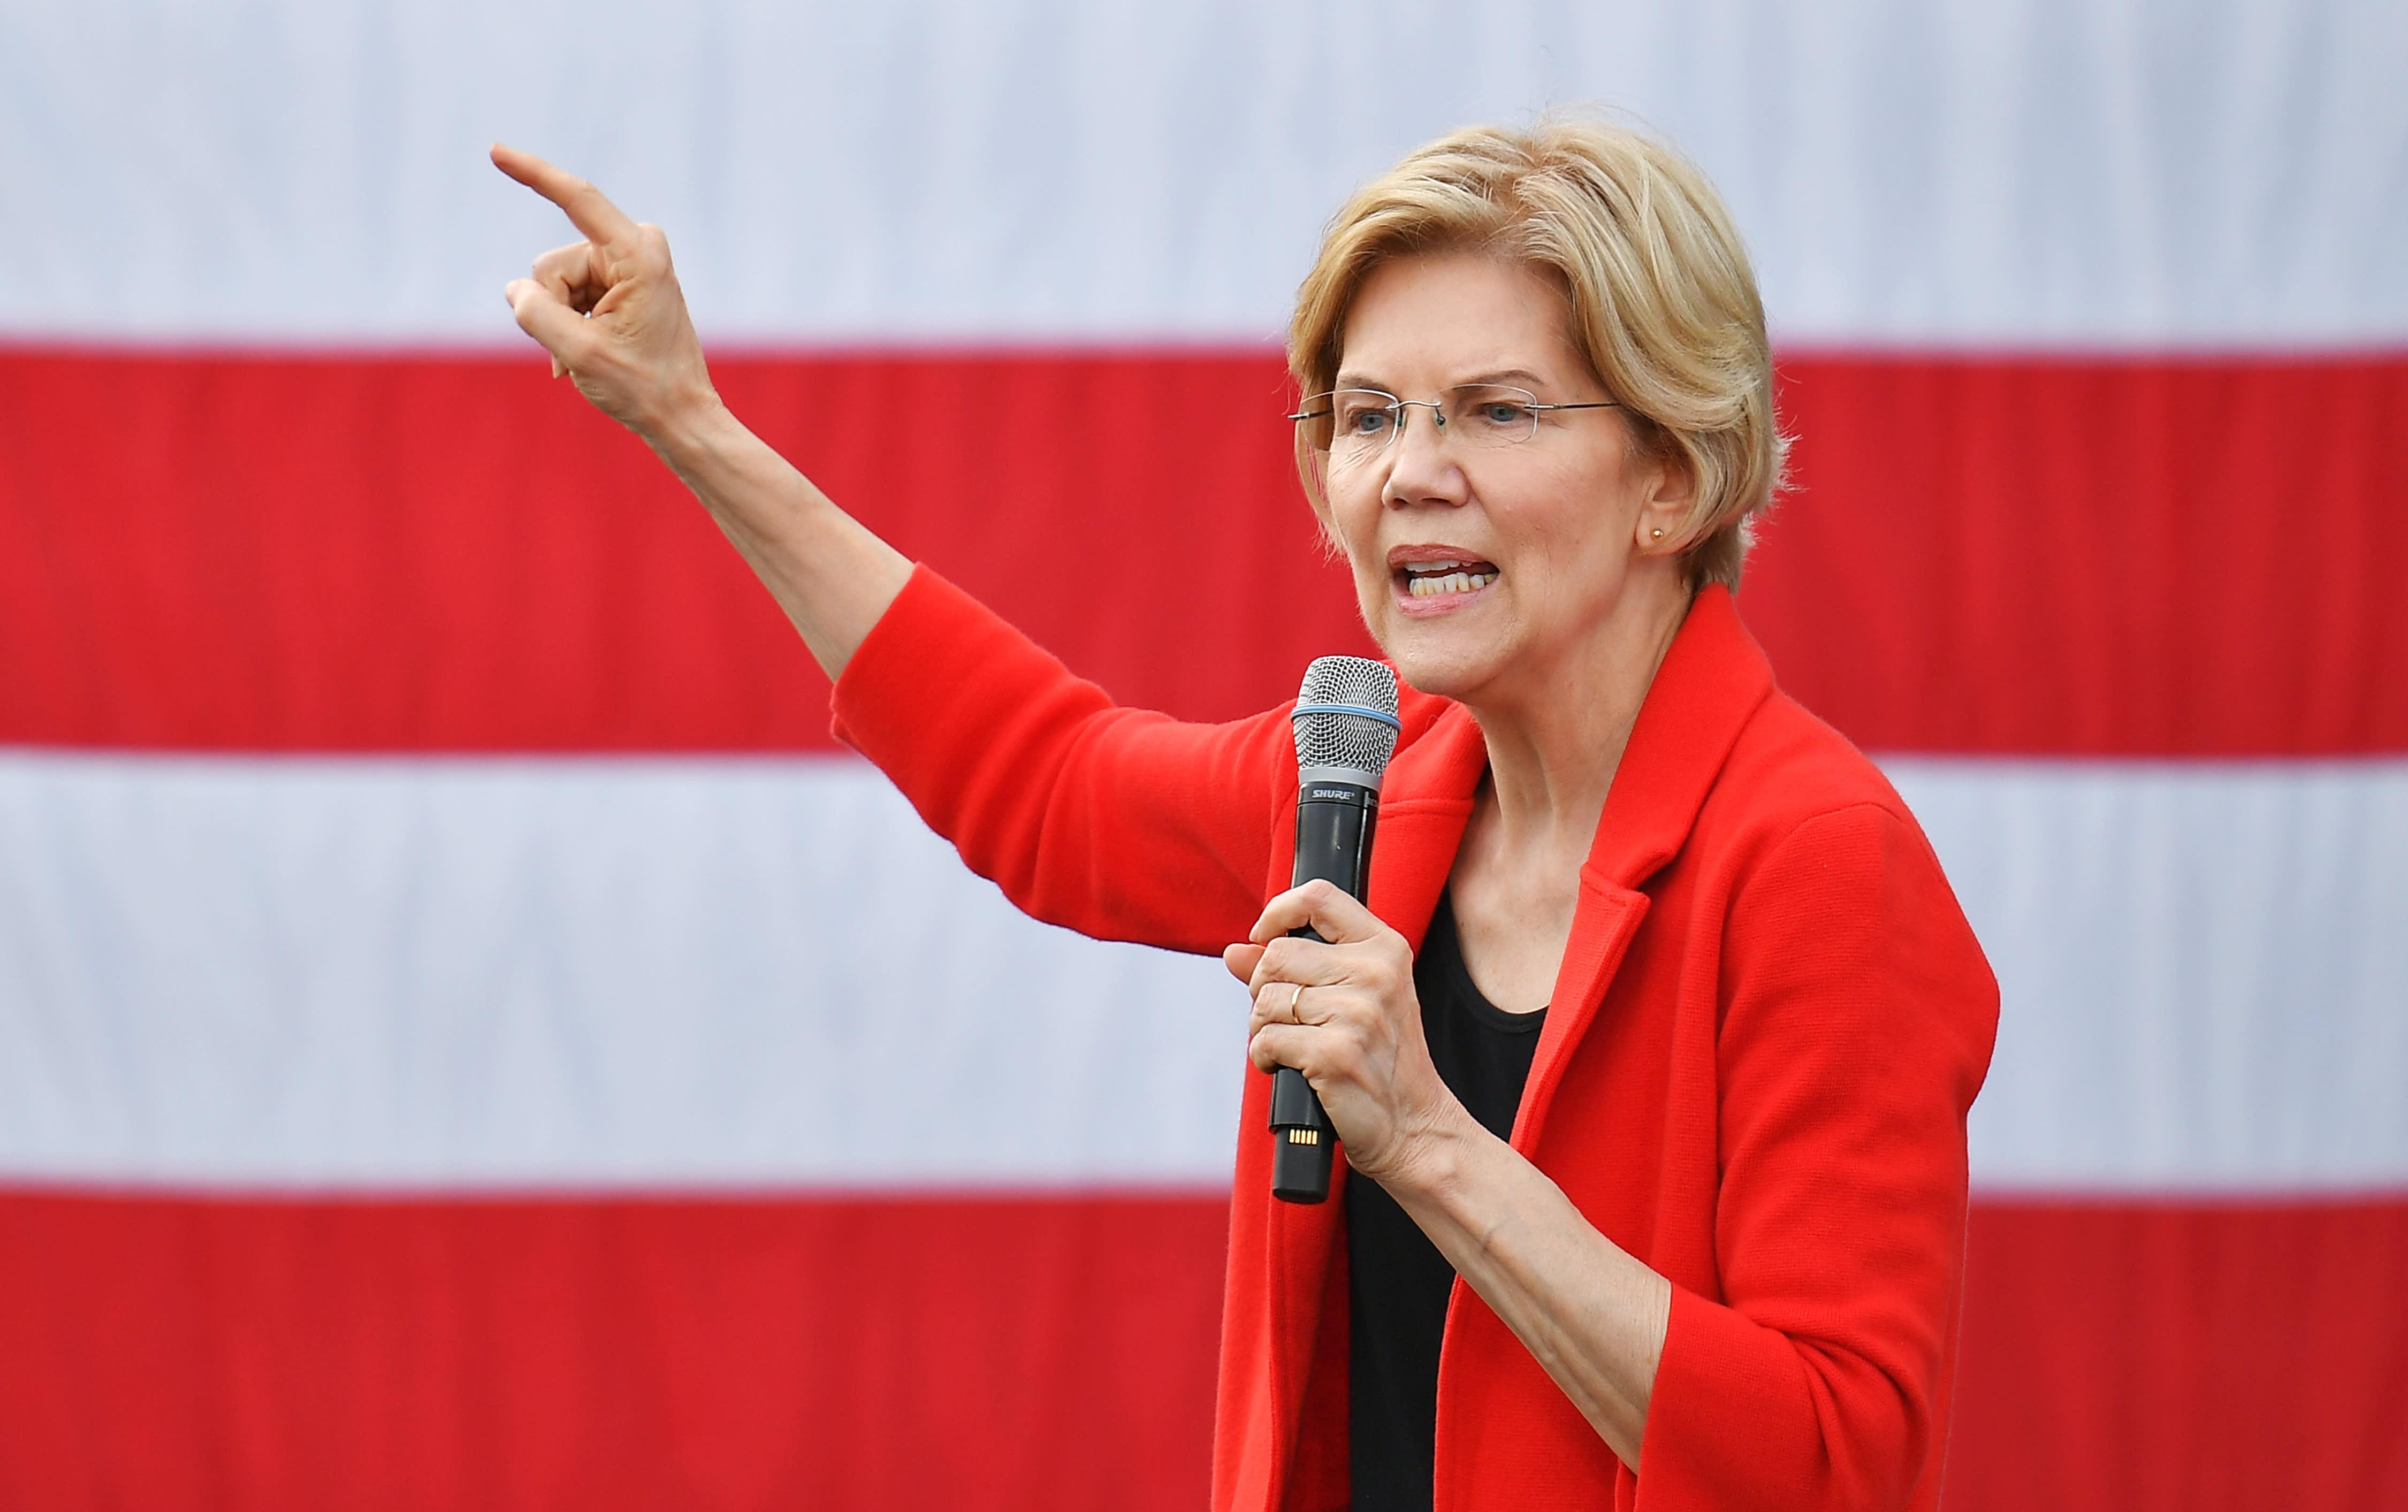 Elizabeth Warren and AOC target Treasury Secretary Mnuchin over Sears bankruptcy